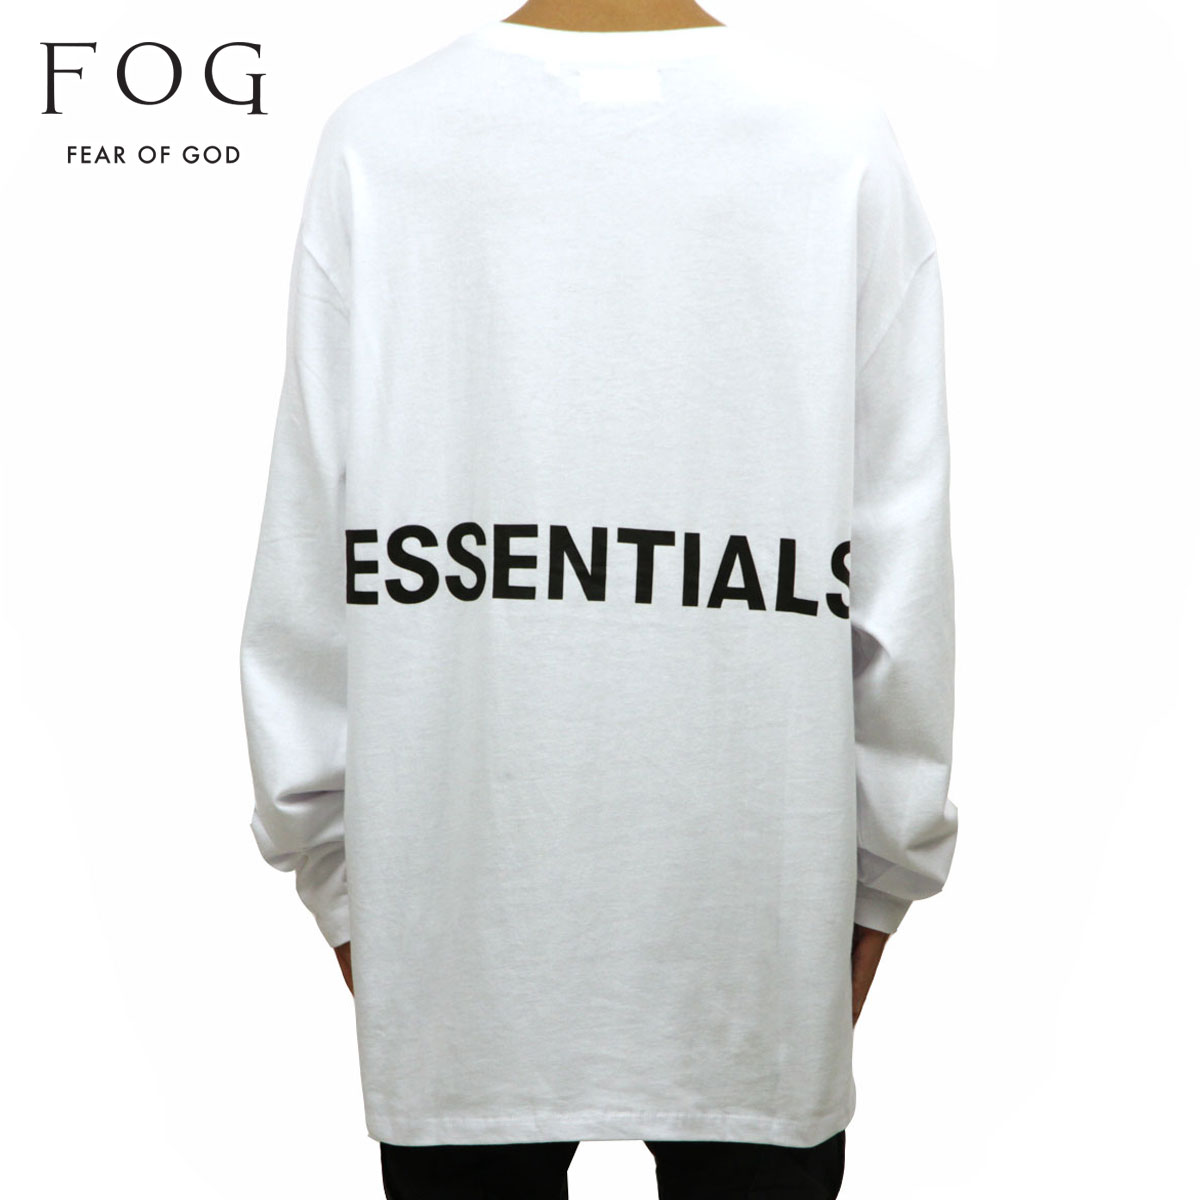 70867238e Fear of god FEAR OF GOD regular article men crew neck back print long  sleeves T-shirt FOG - FEAR OF GOD ESSENTIALS BOXY GRAPHIC LONG SLEEVE  T-SHIRT ...